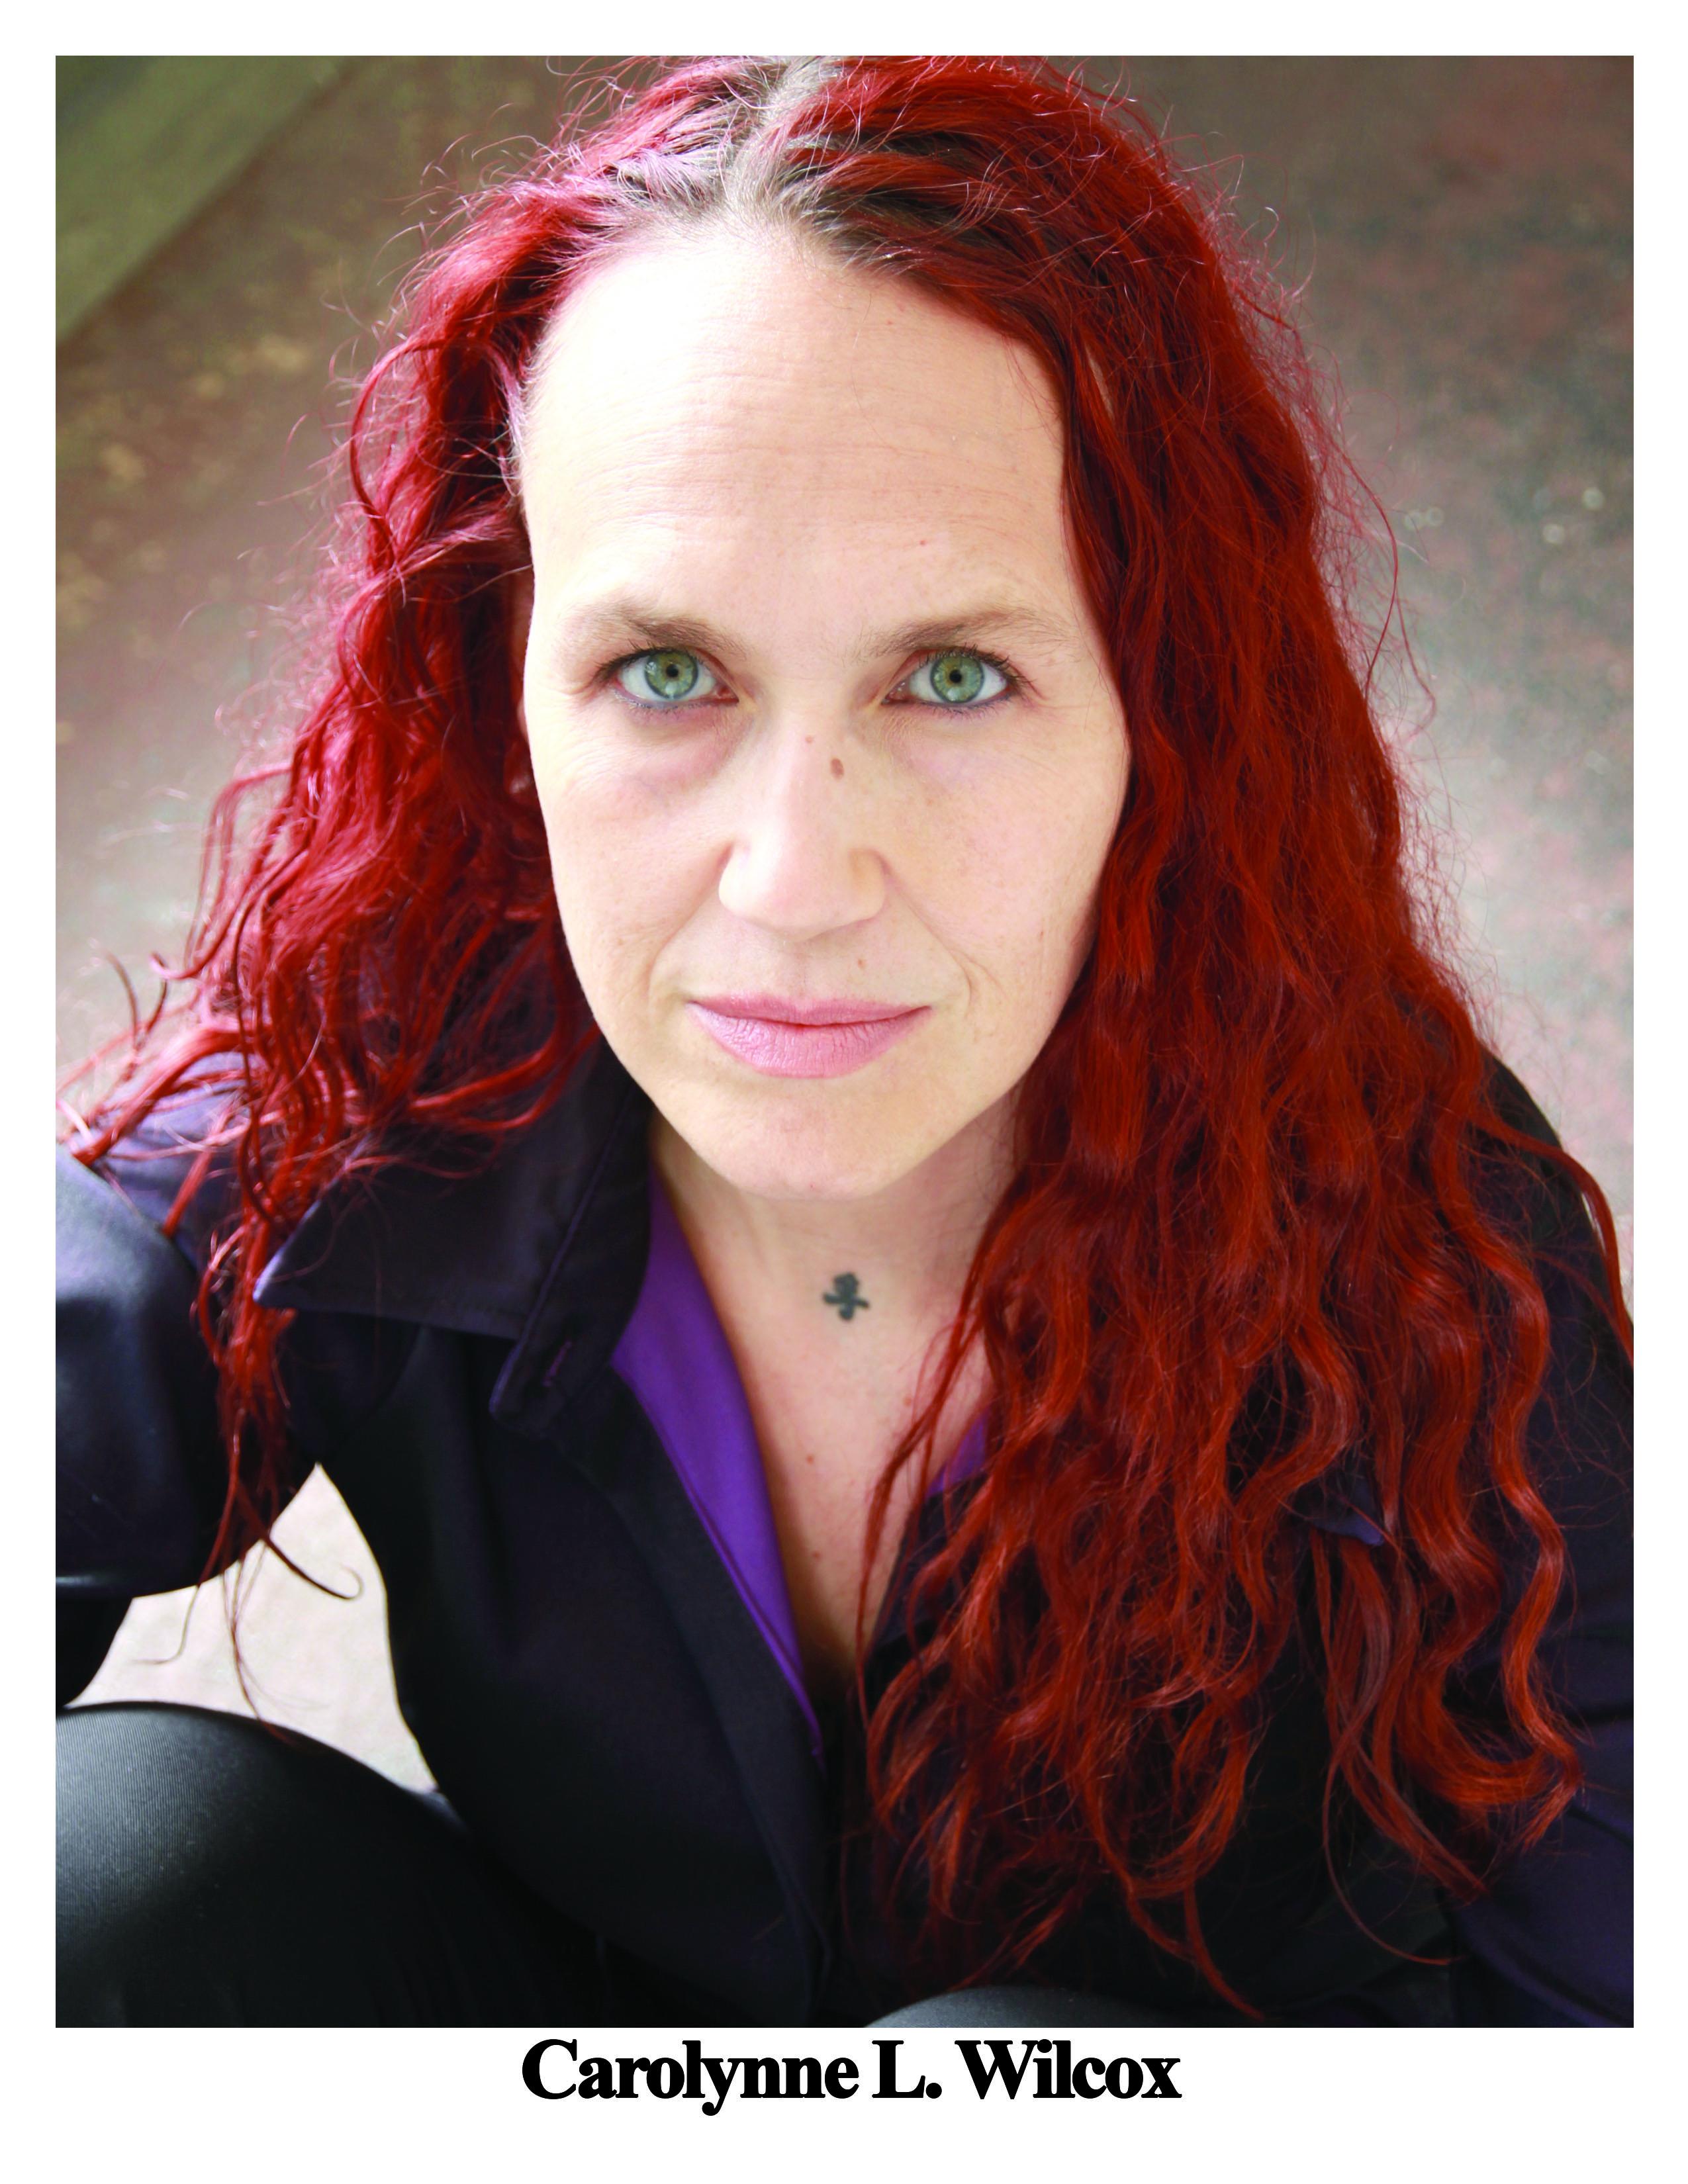 Carolynn Wilcox Headshot